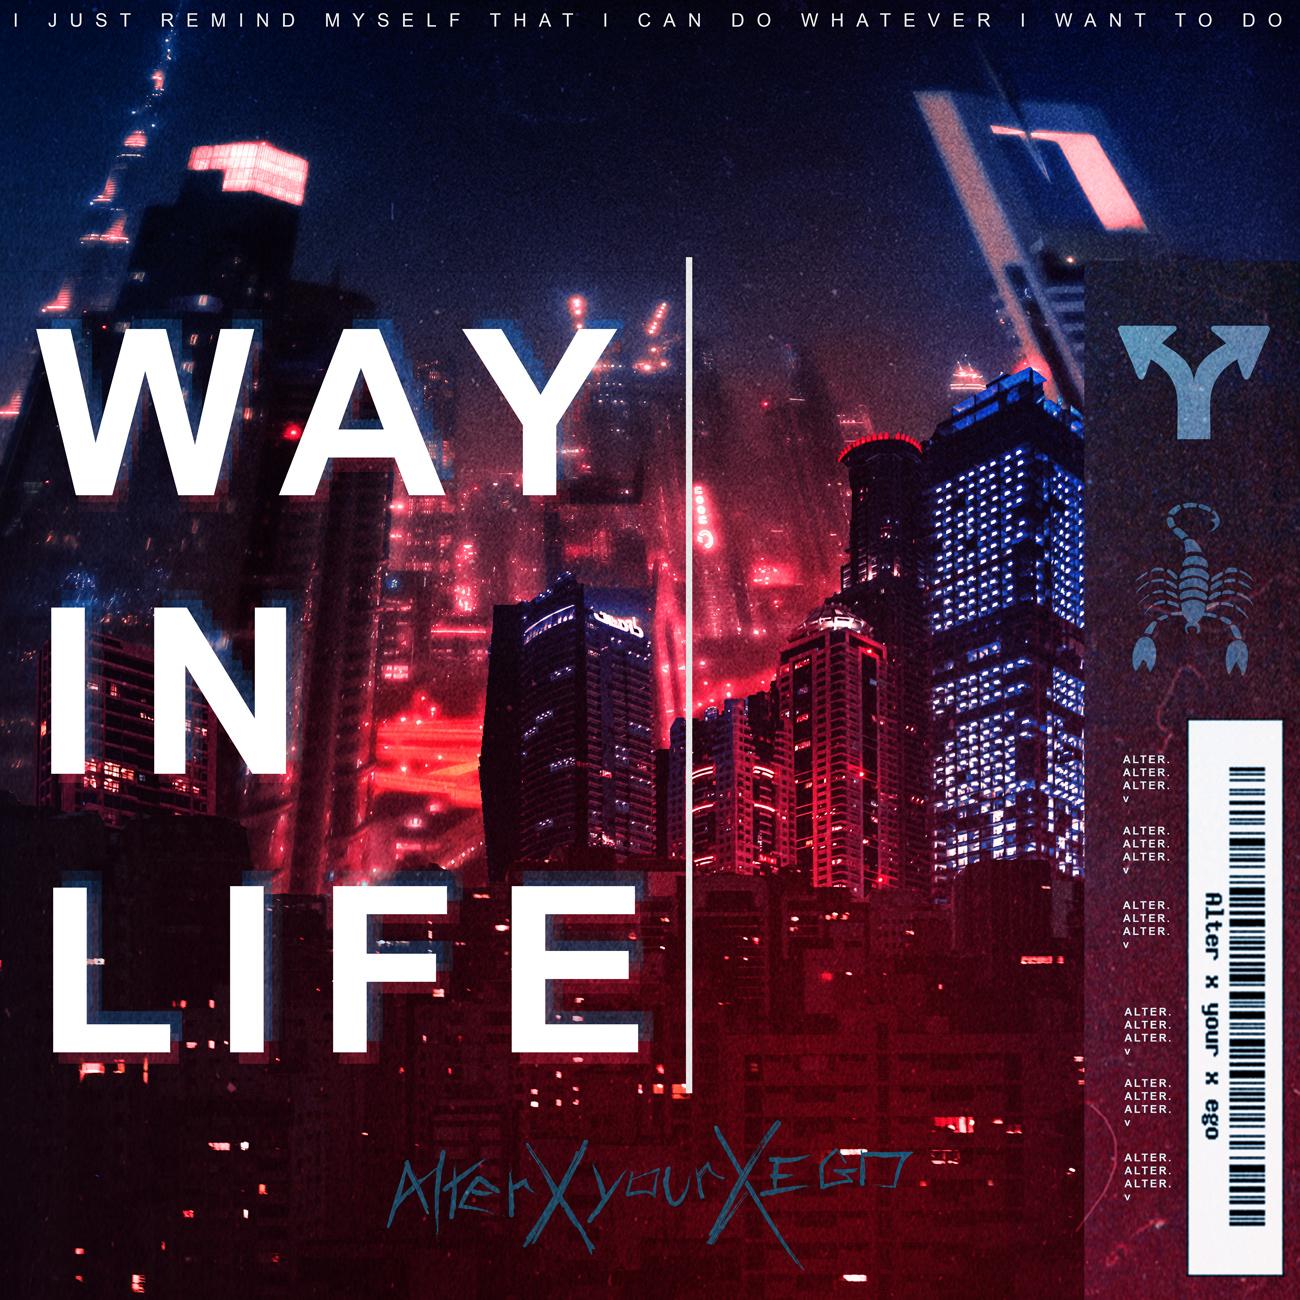 WAY IN LIFE - Single / Alterxyourxego